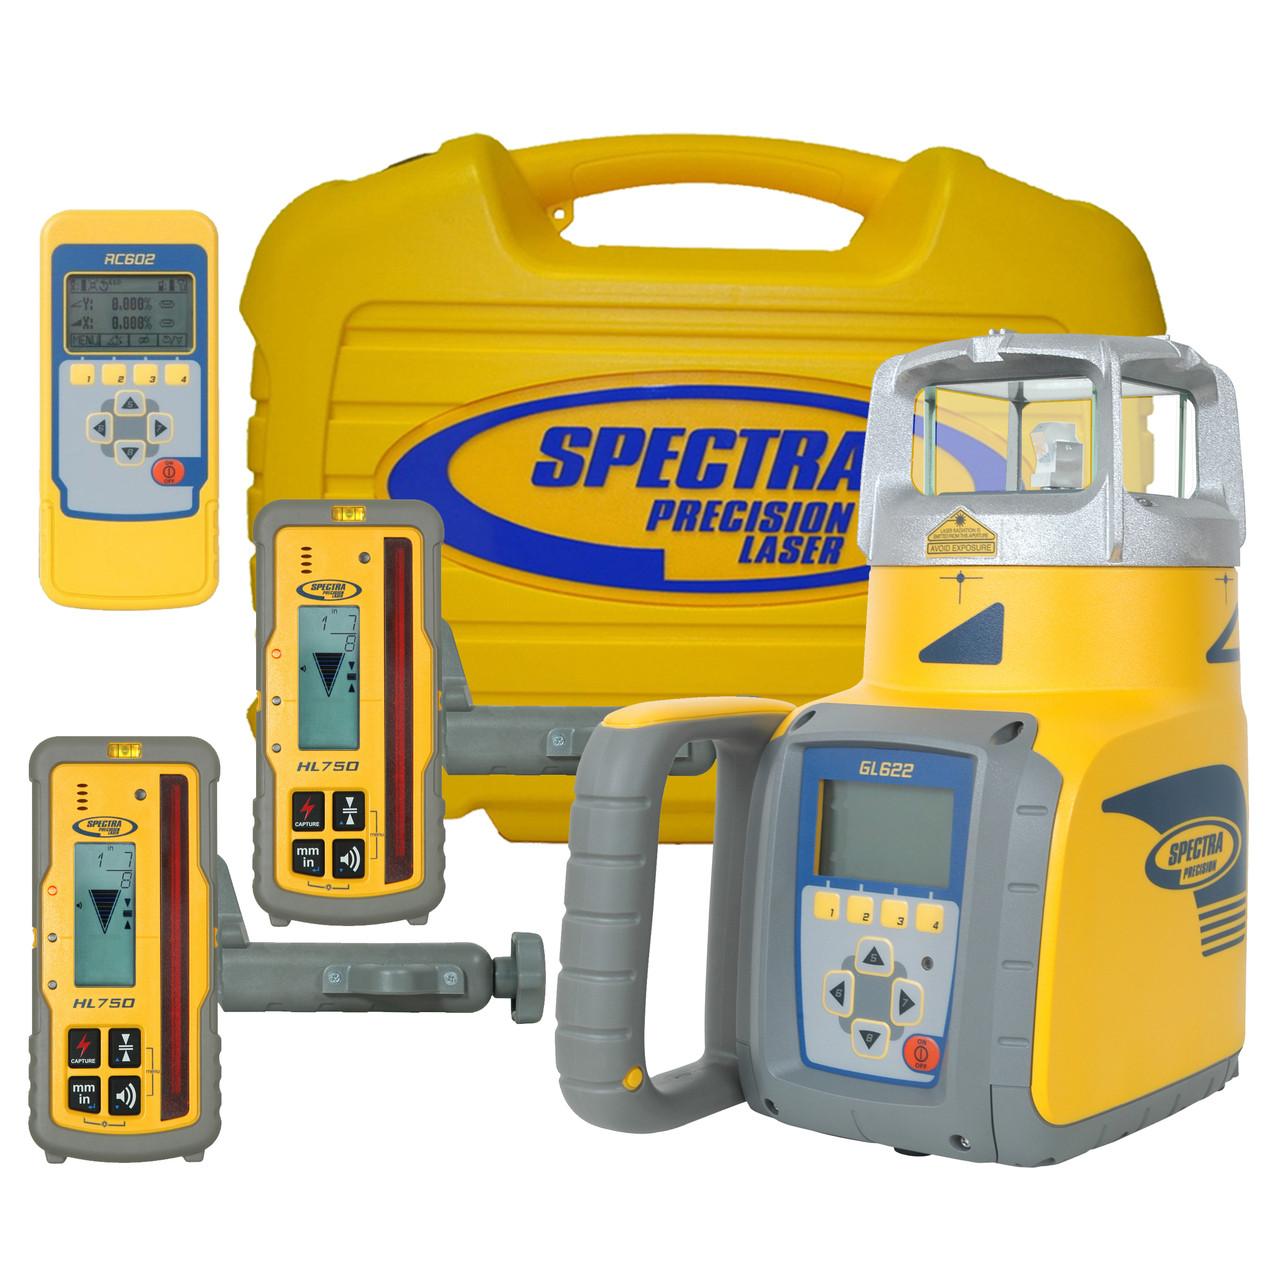 Spectra GL622 Dual grade laser HL750 Receiver RC602 Remote CR600 Receiver